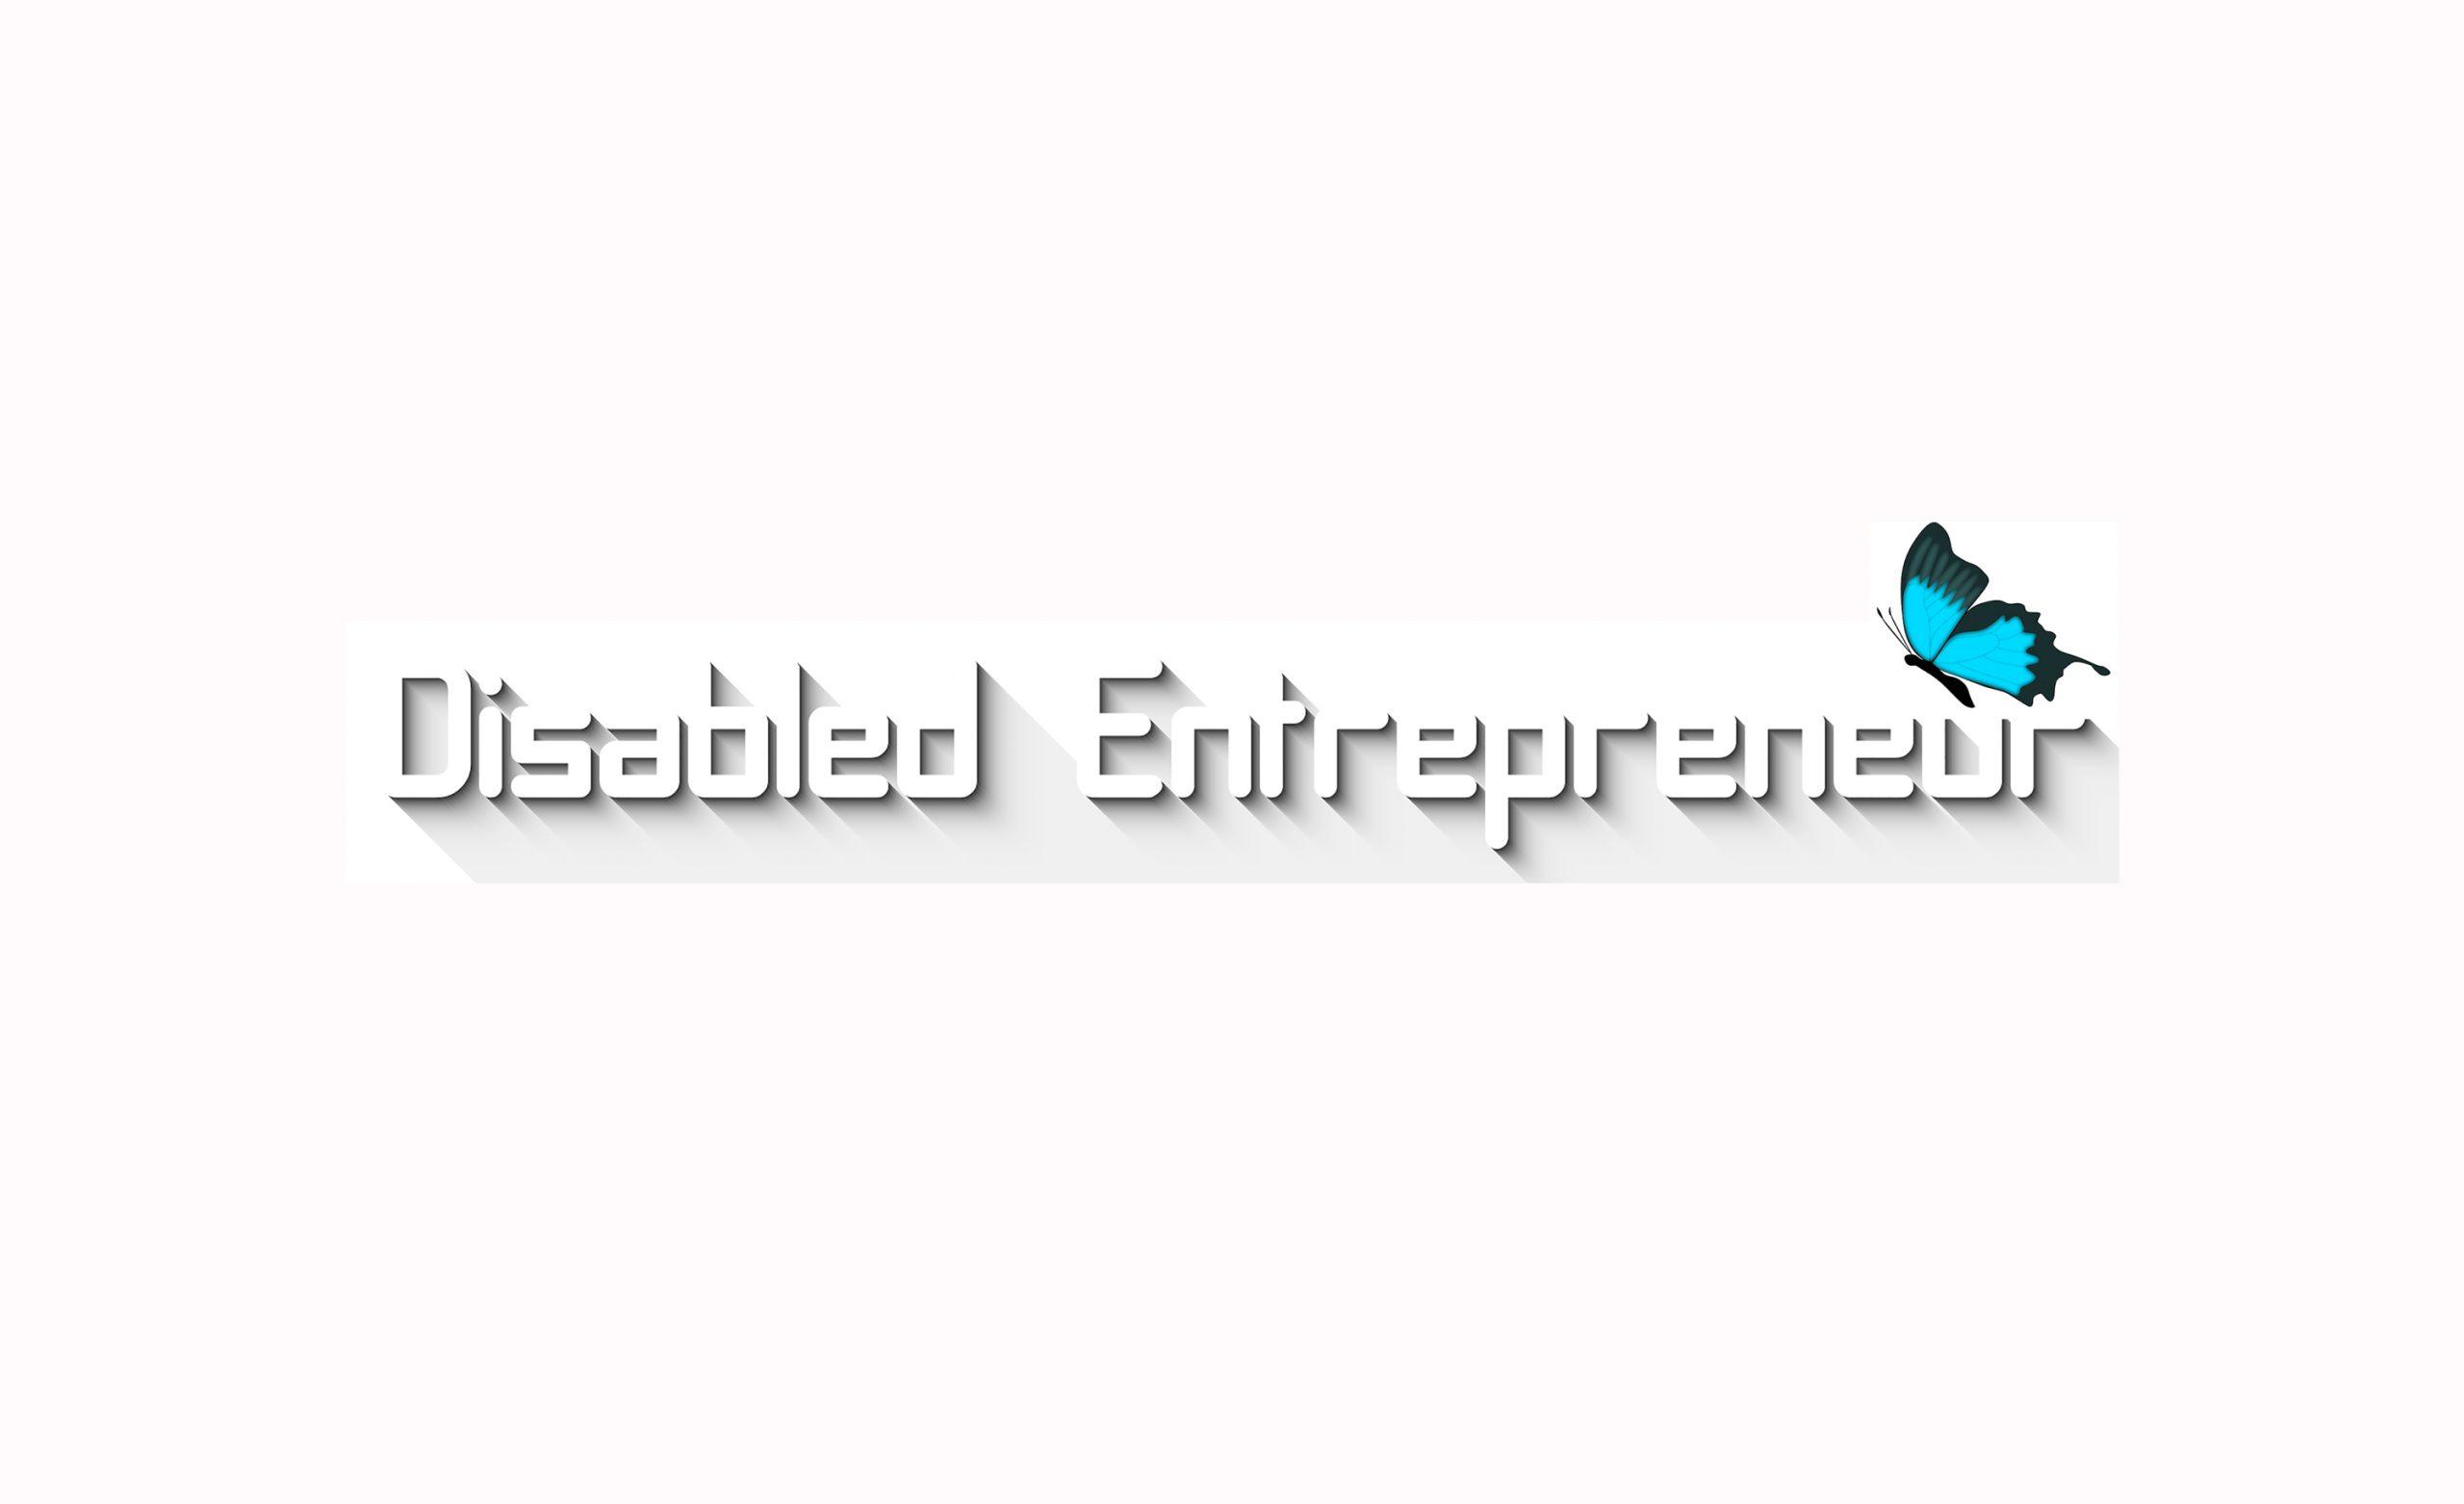 Disabled Entrepreneur